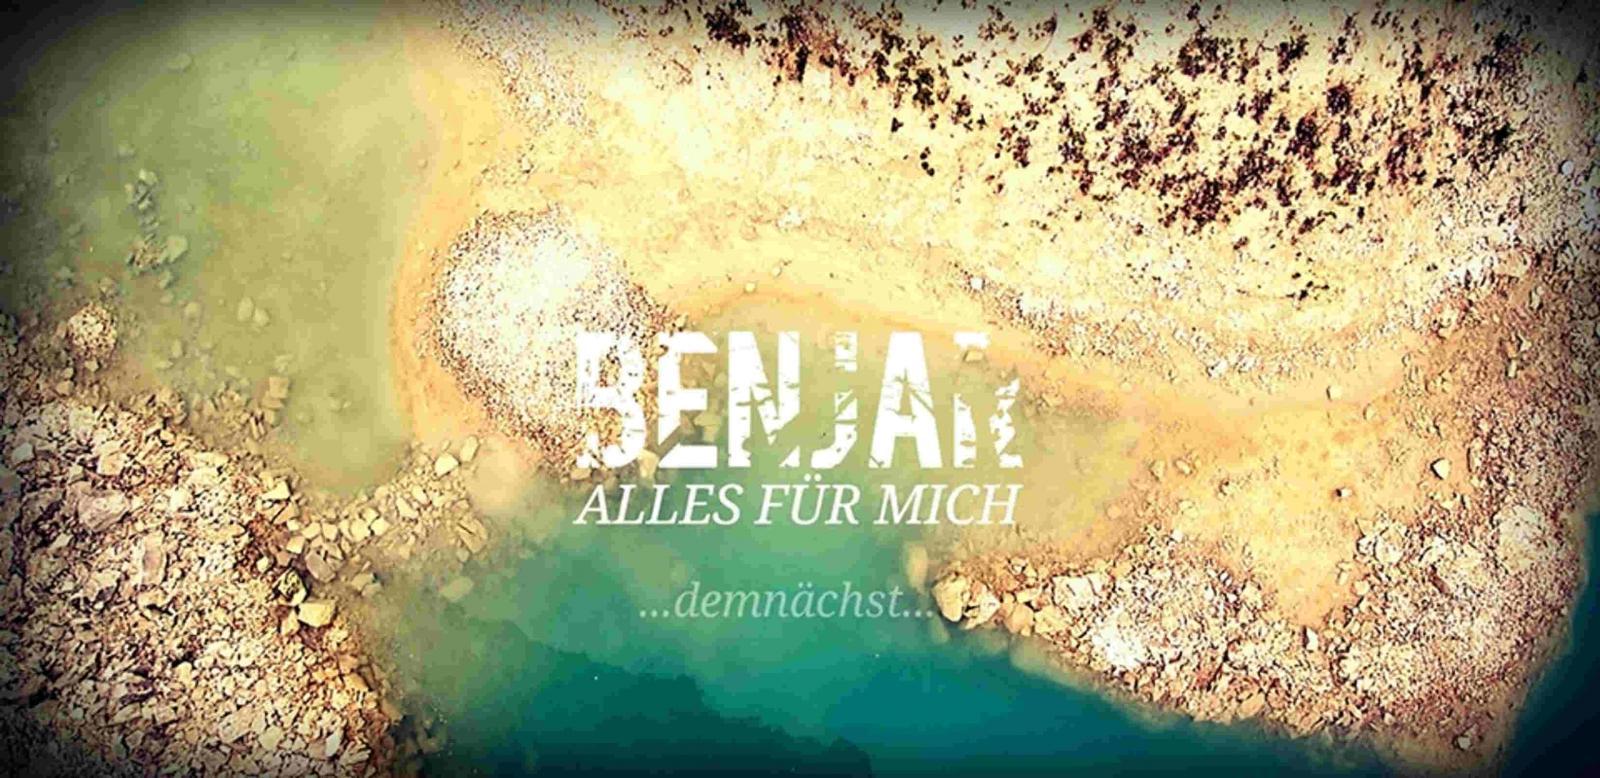 Upcoming: Benjar - Alles Für Mich